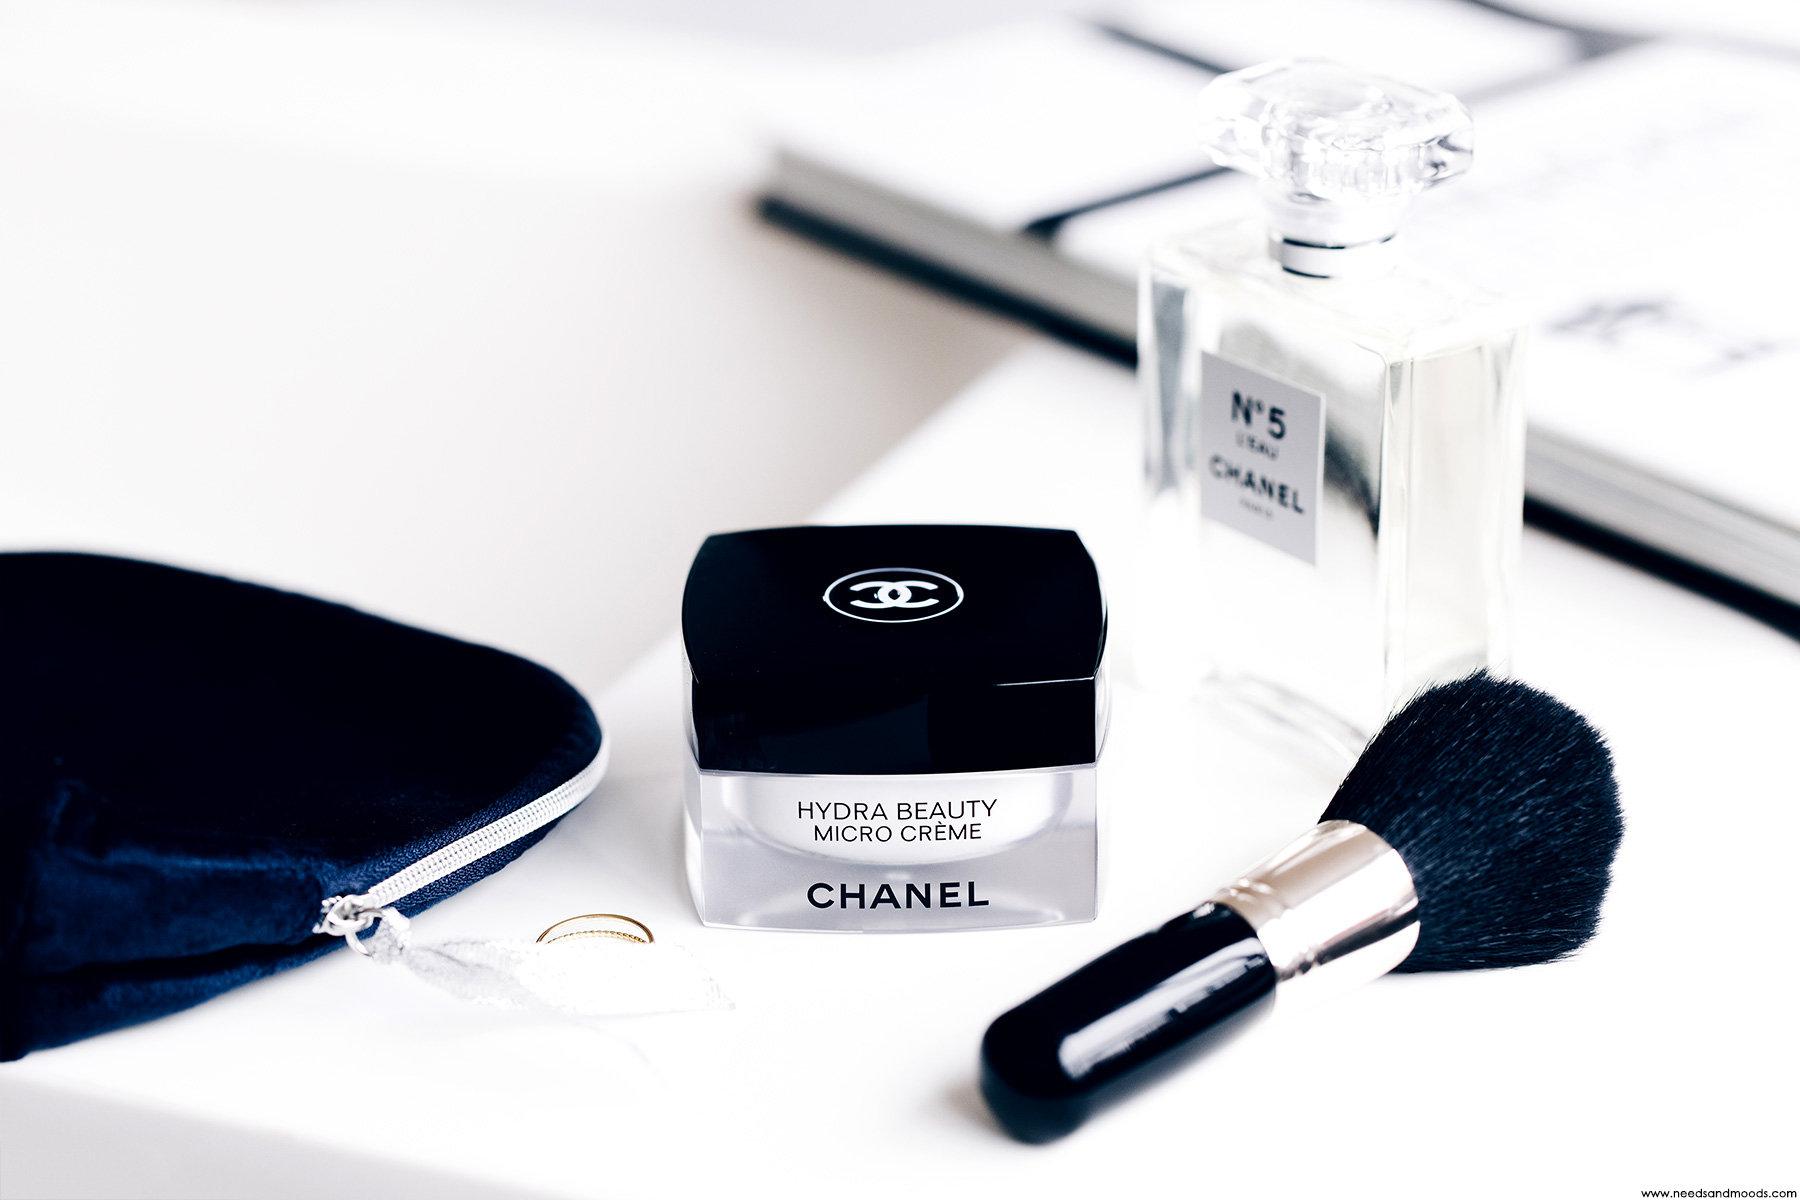 chanel hydra beauty micro creme avis